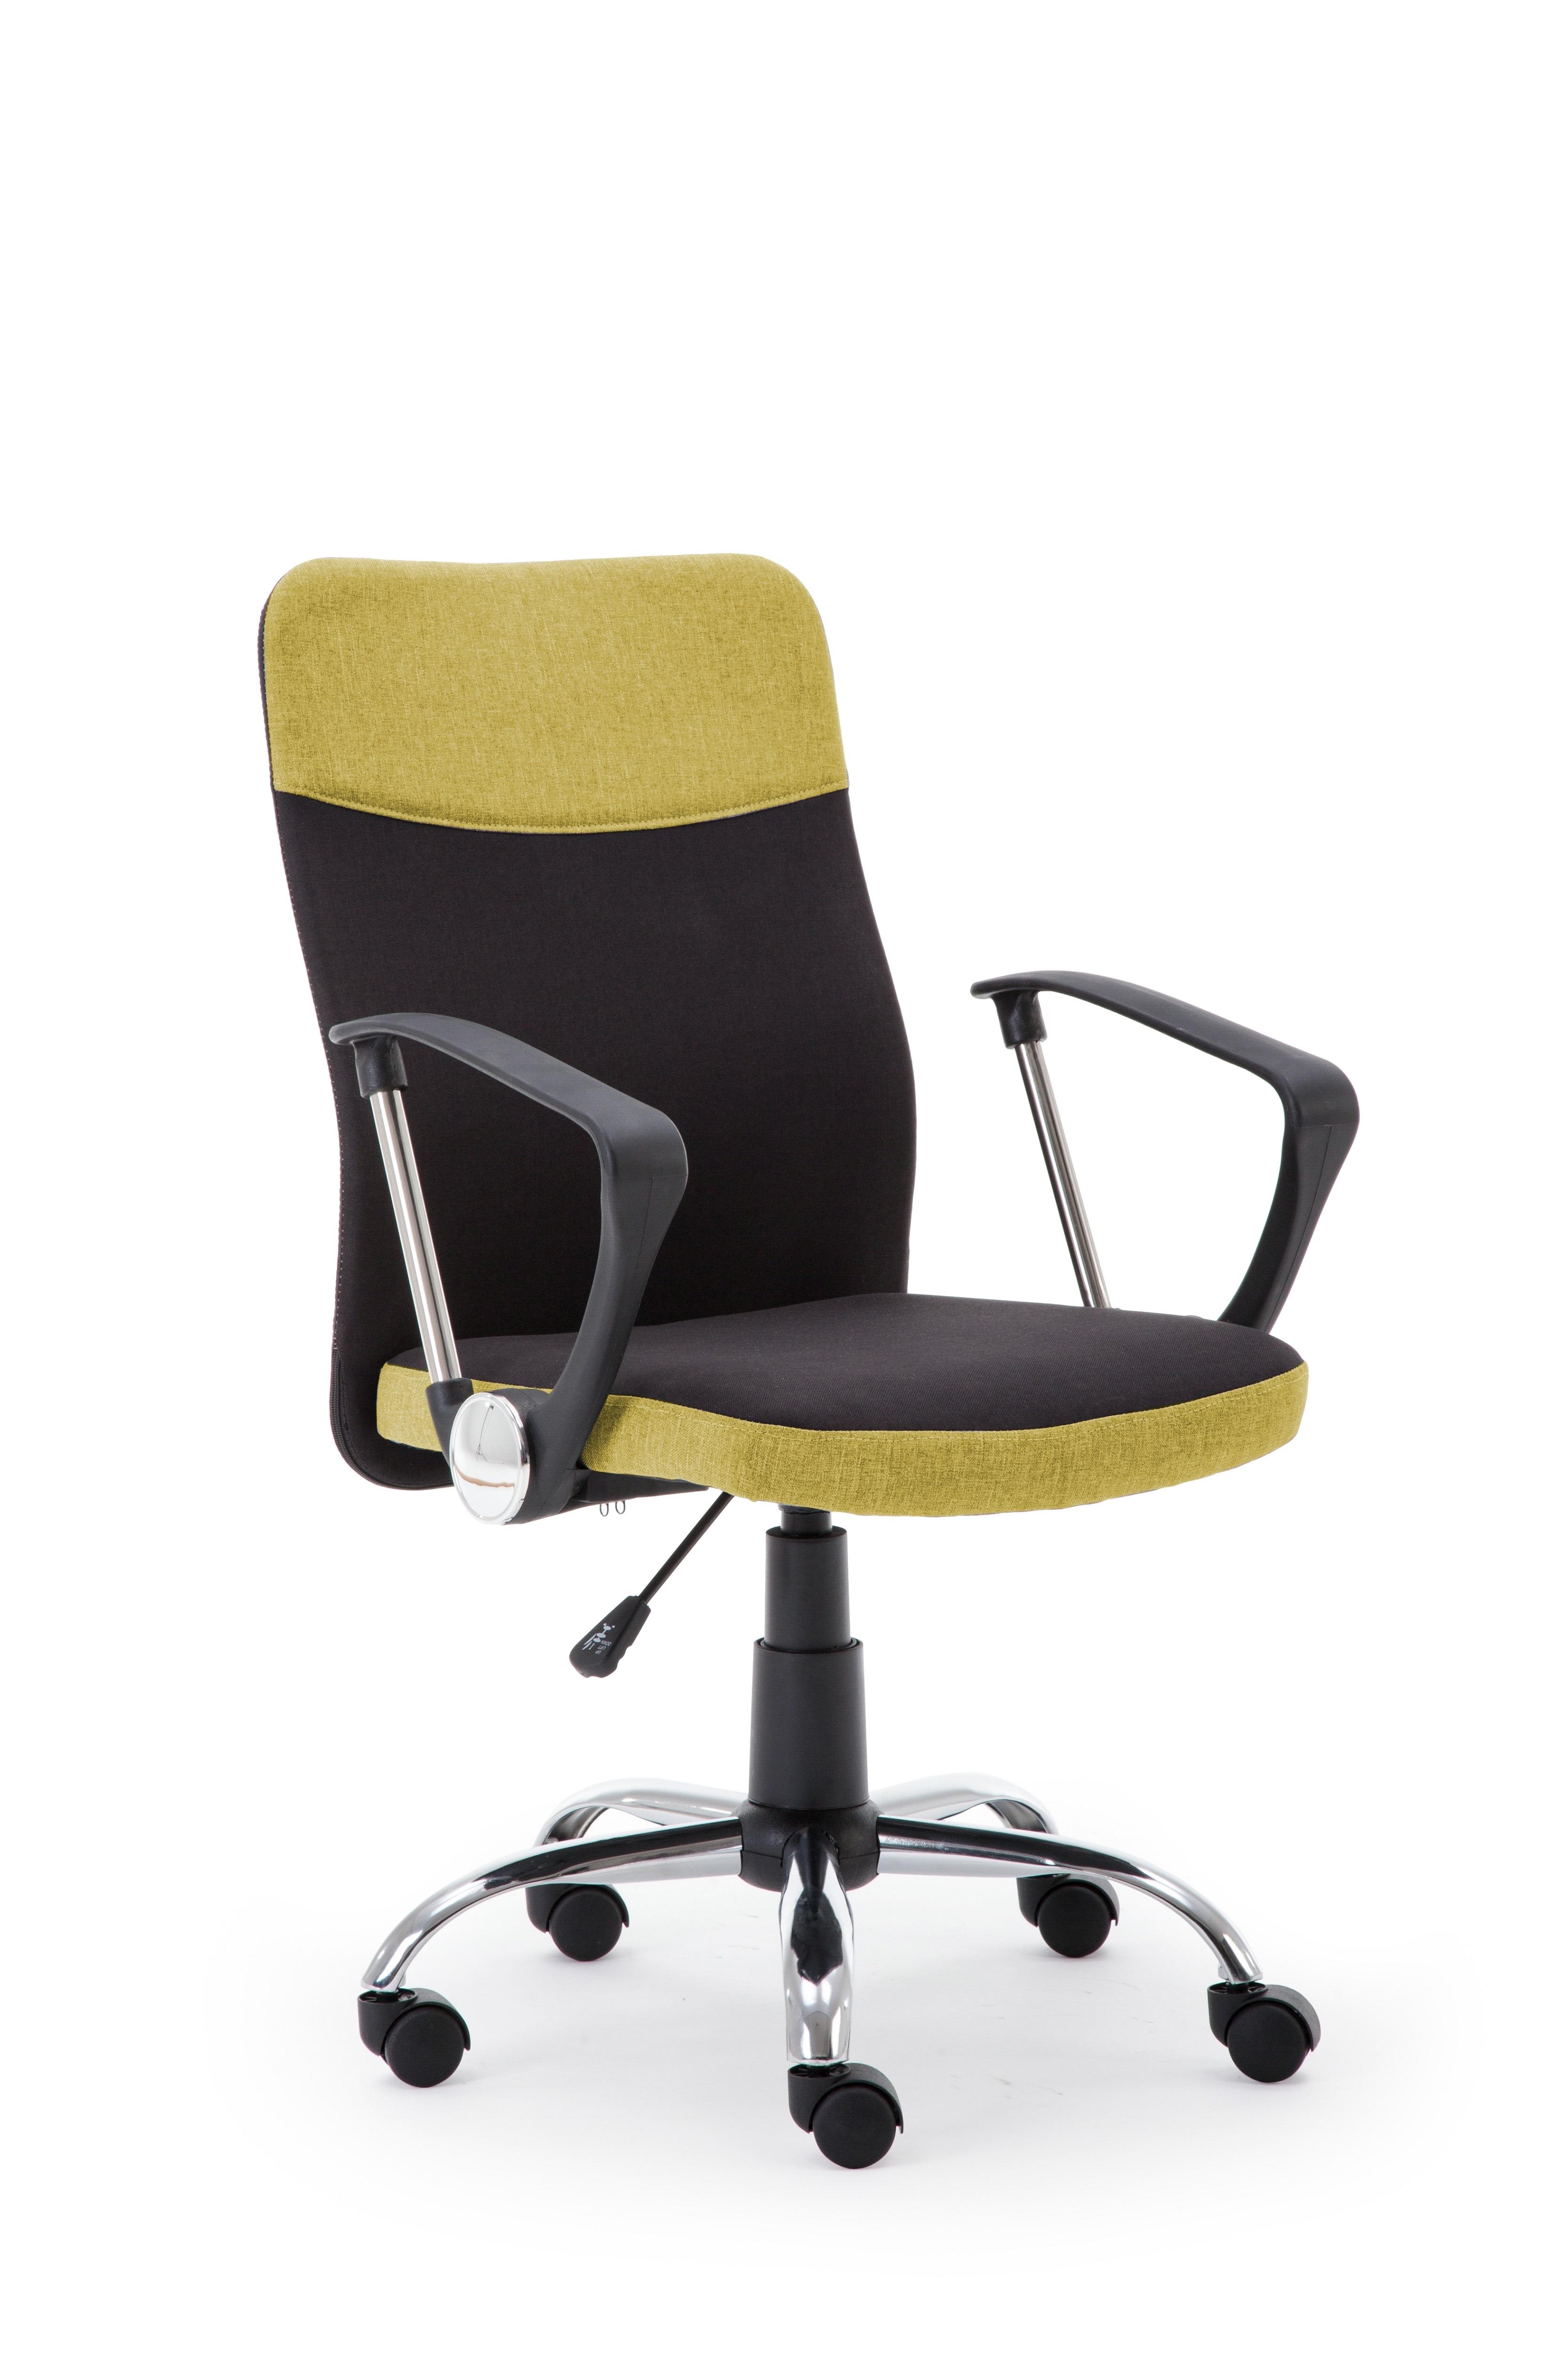 Scaun de birou ergonomic Topic Black / Green, l57xA60xH94-104 cm poza